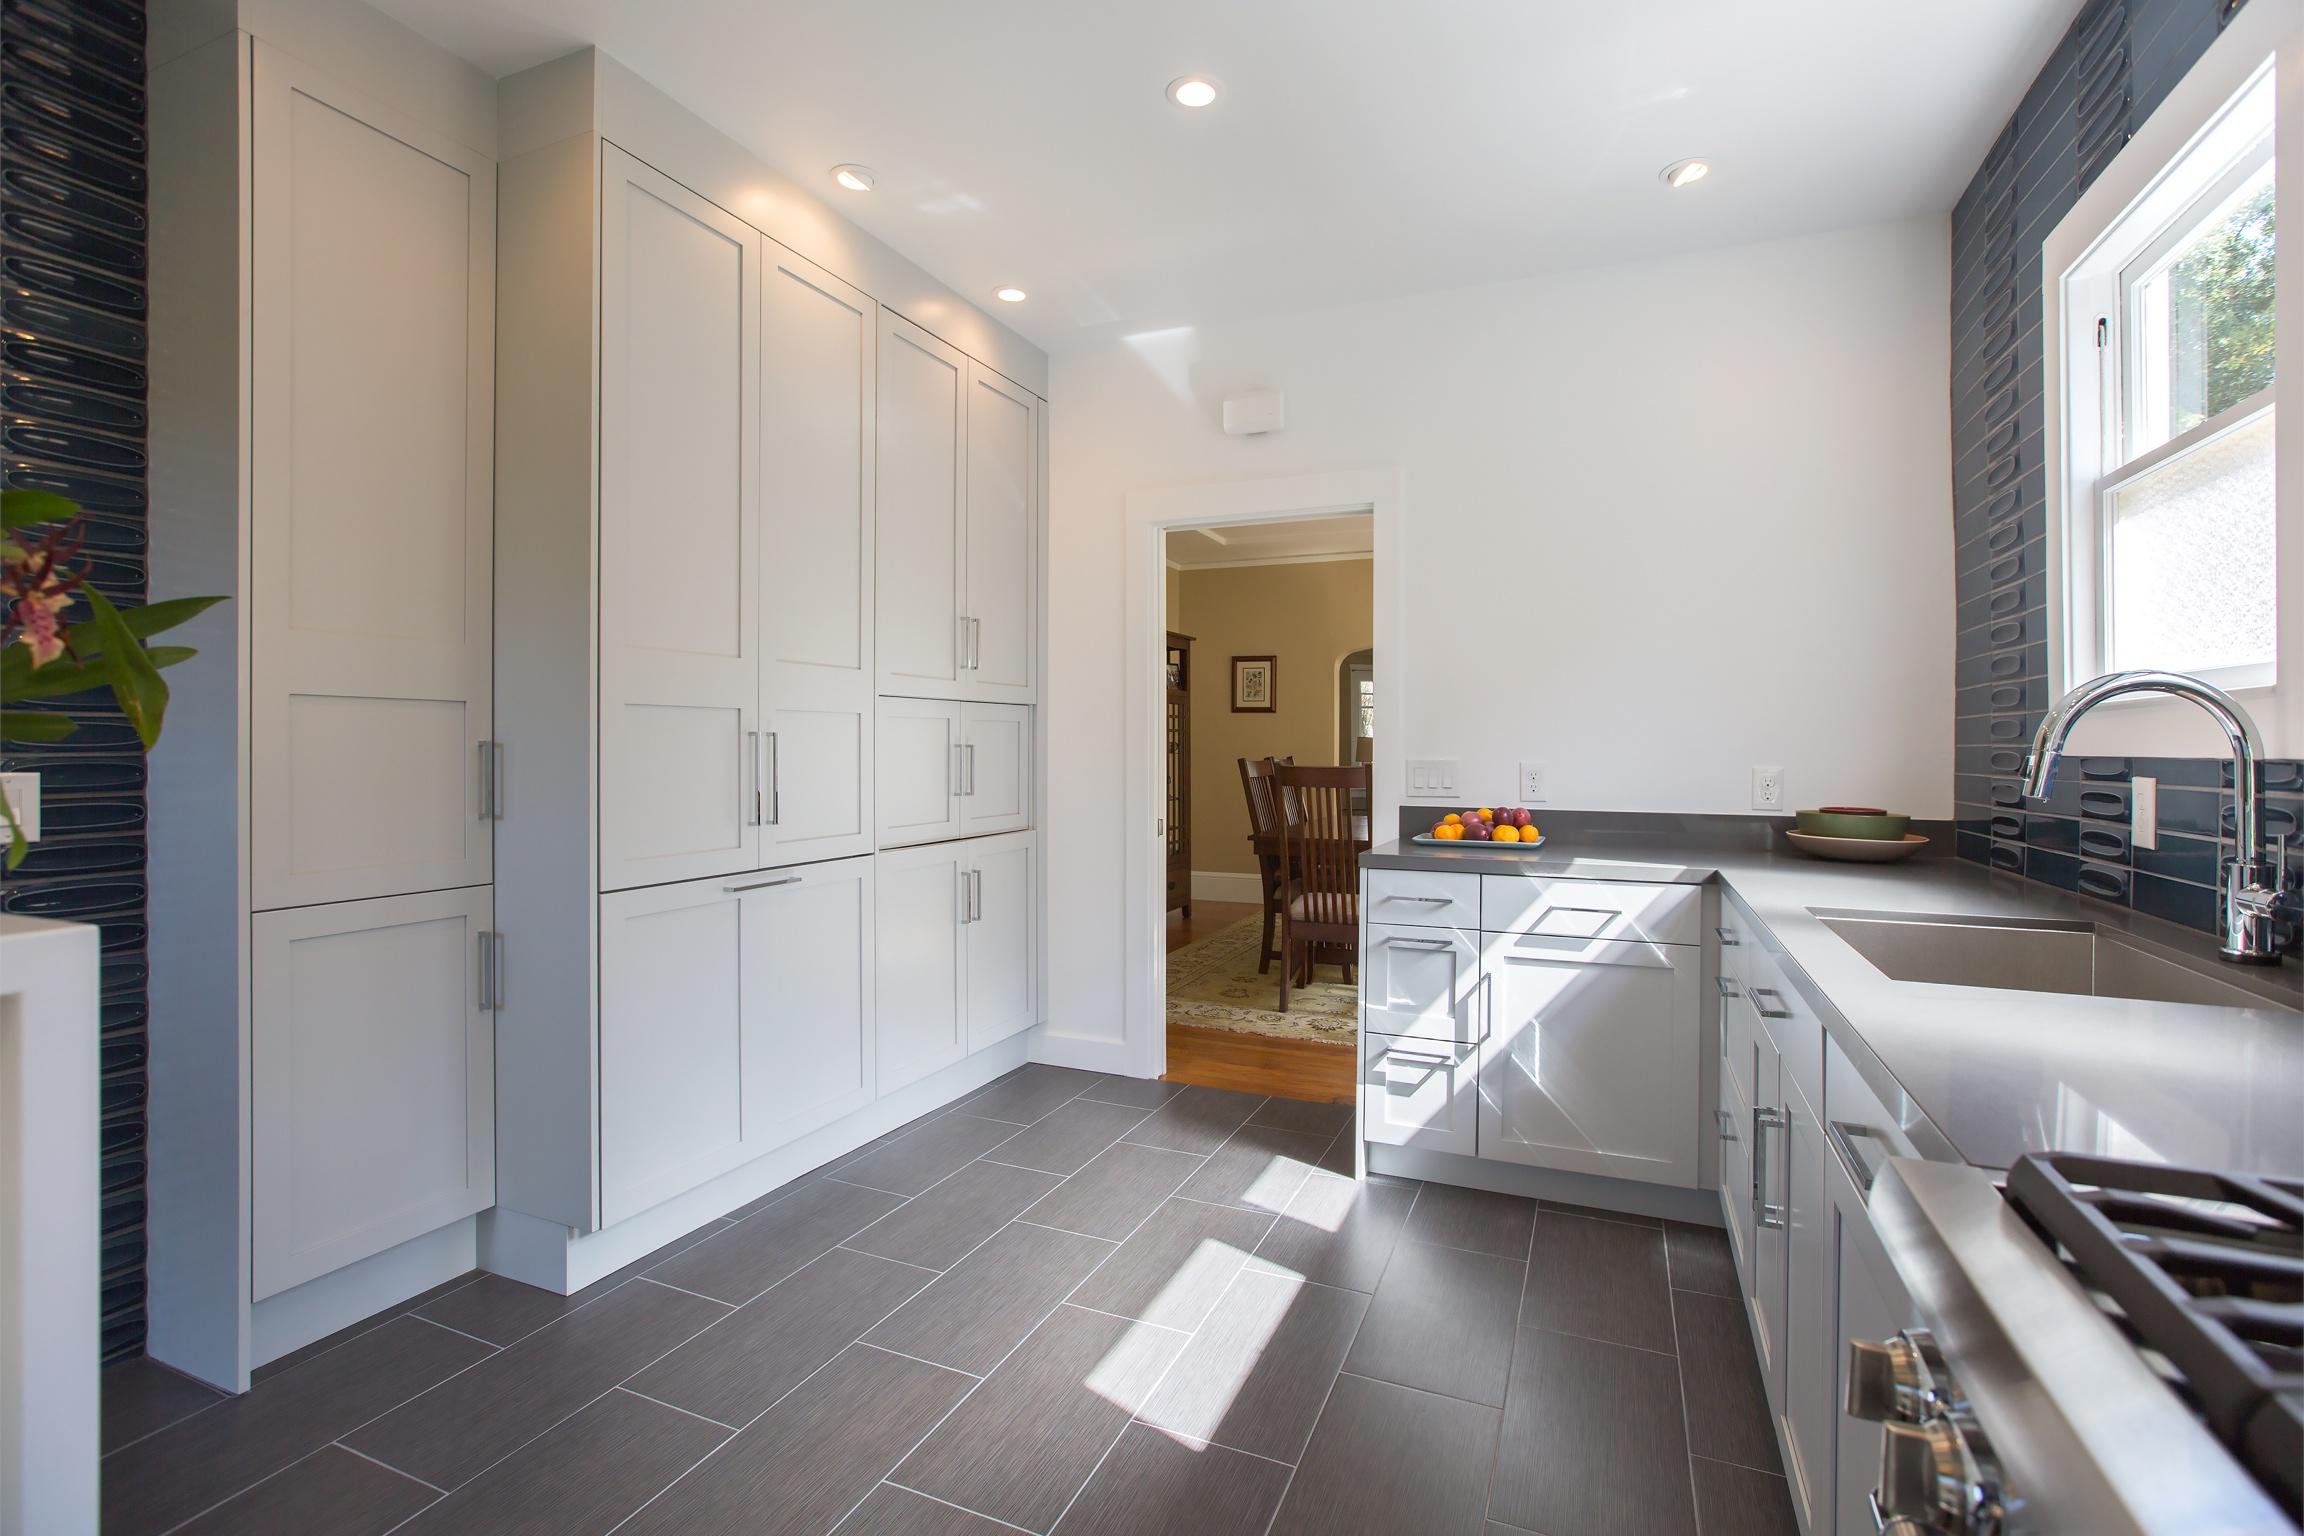 william-adams-design-christmas-tree-lane-2-kitchen-white-cabinets-grey-floors.jpg